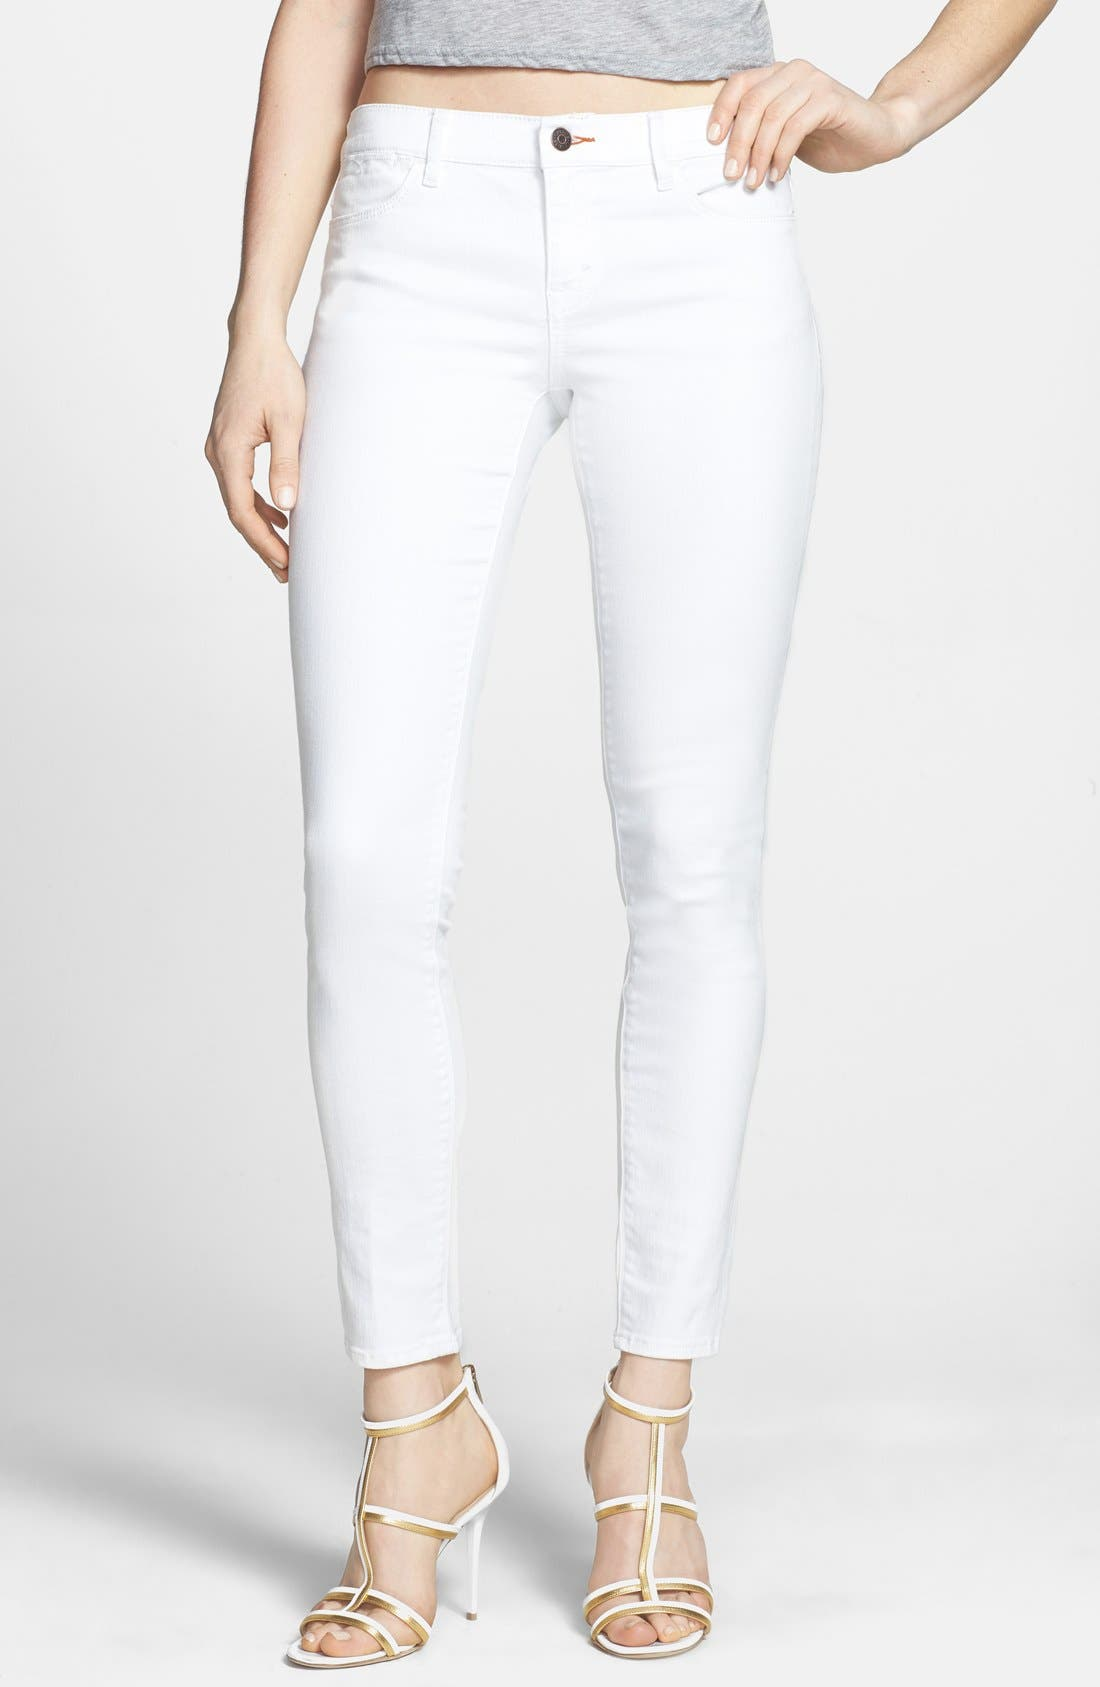 Alternate Image 1 Selected - Dittos 'Selena' Super Skinny Jeans